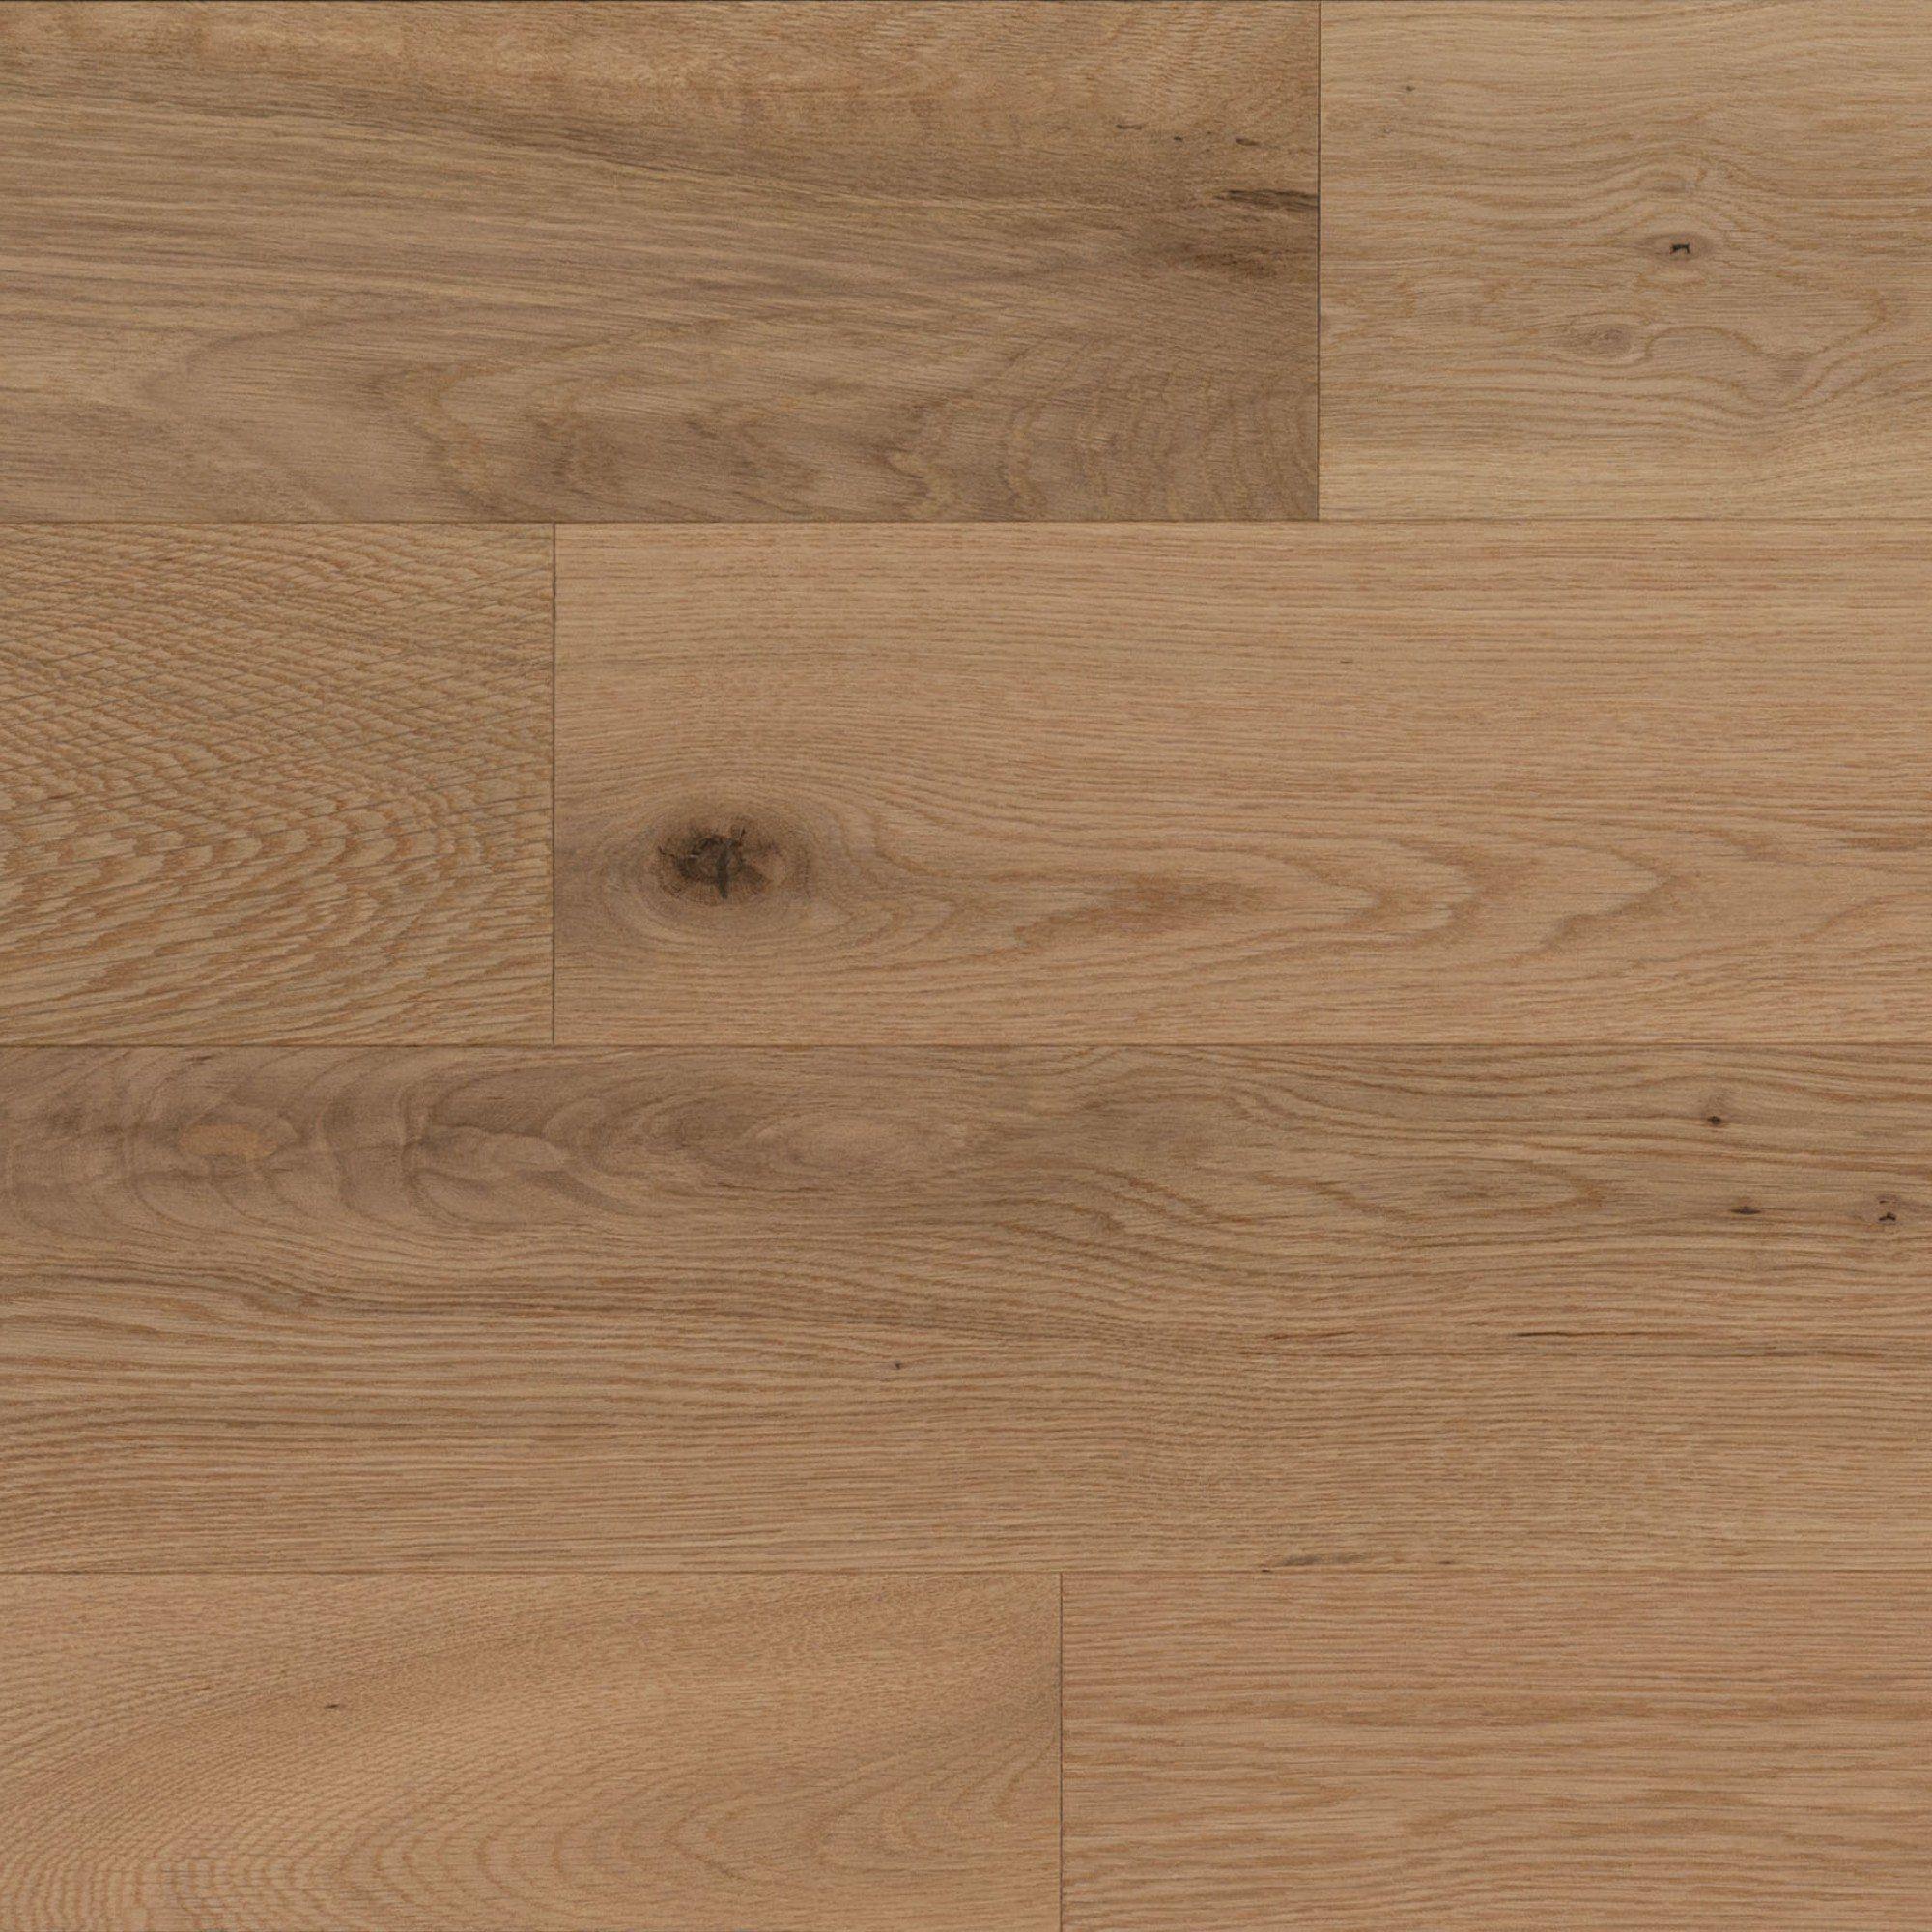 Natural White Oak Character Brushed Mirage Hardwood Floors White Oak Flooring Luxury Vinyl Flooring